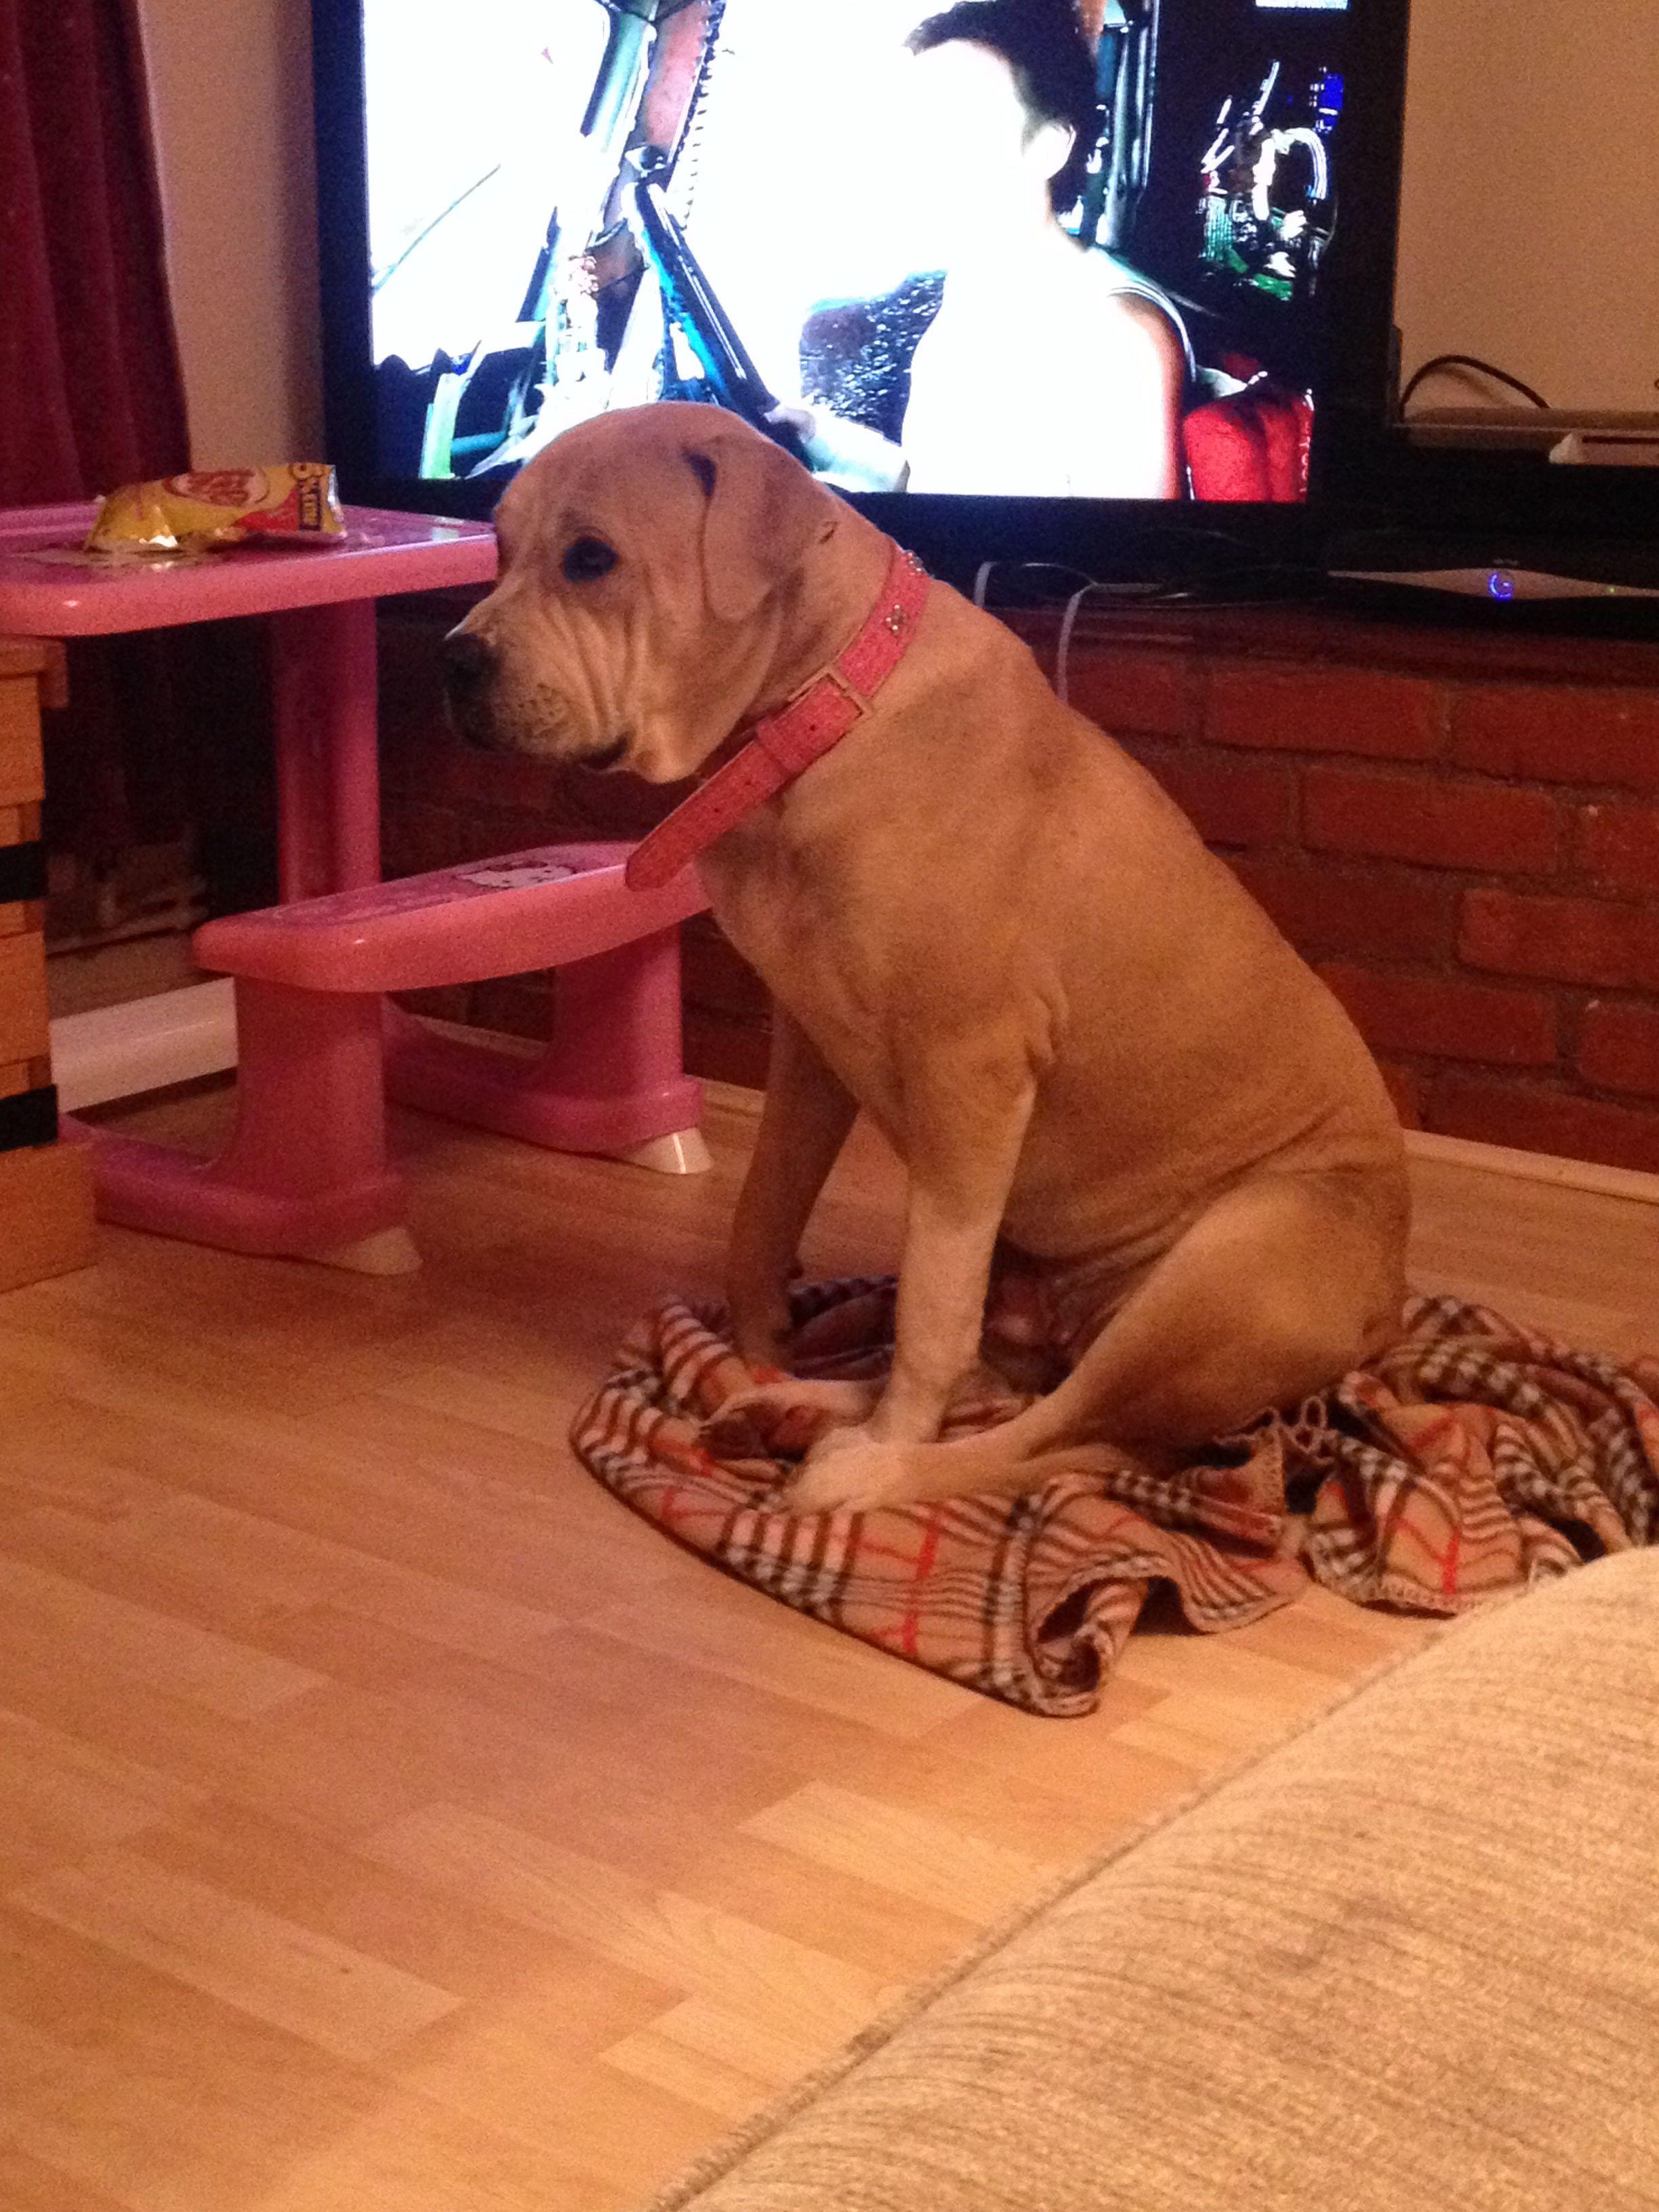 tia my bullmastiff x american bulldog 10 months looking more